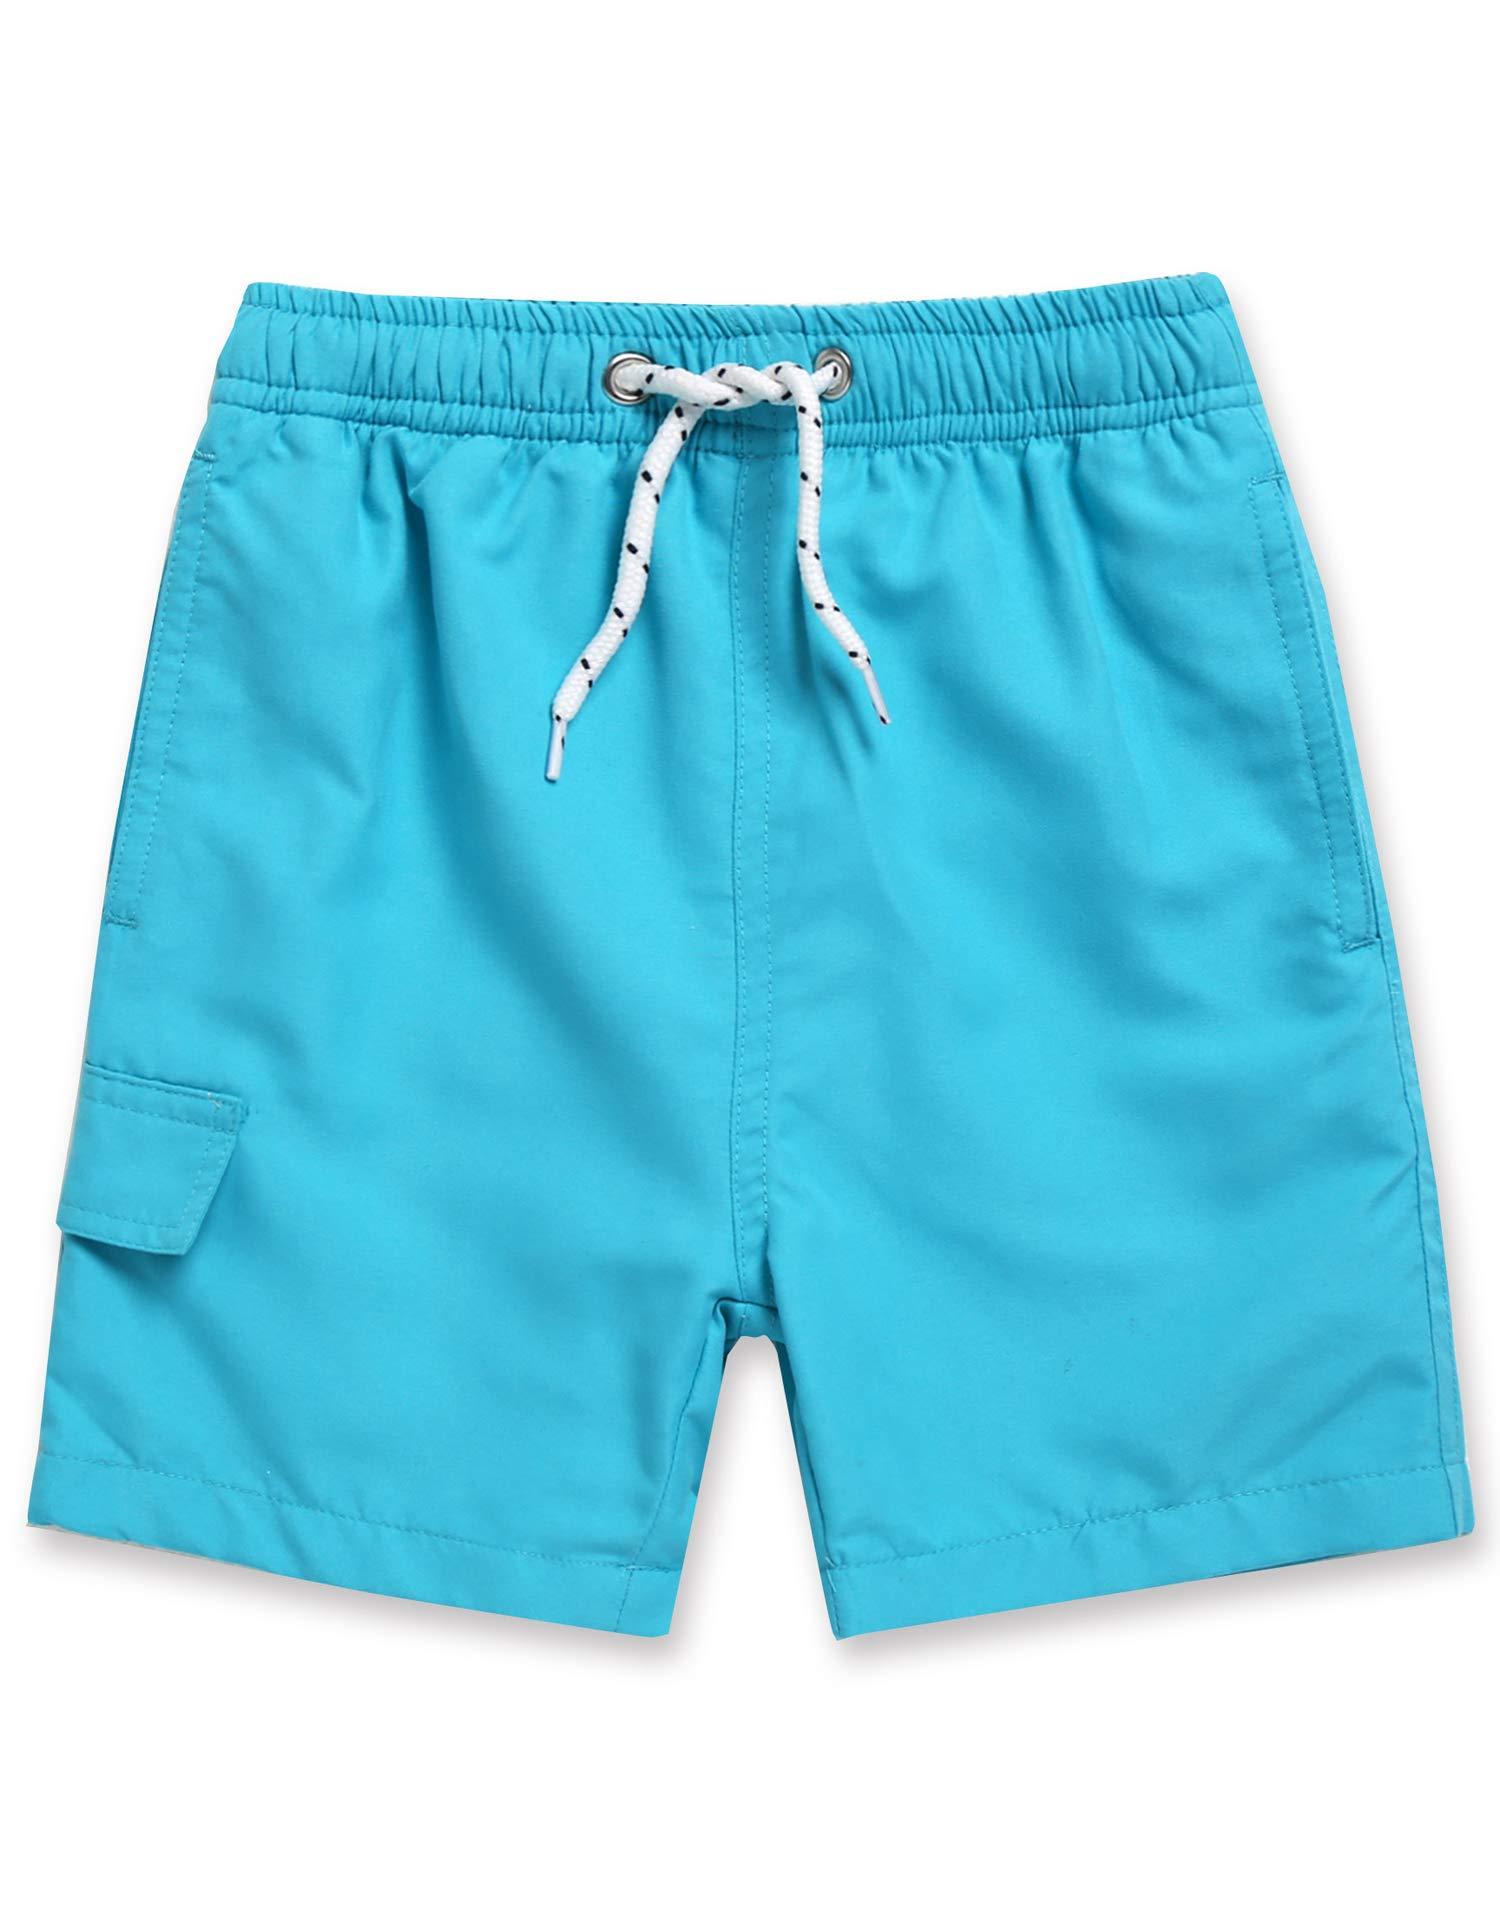 VAENAIT BABY 2-7T Kids Boys Girls UPF 50+ UV Protection Quick Dry Rashguard Swim Top Trunk Board Shorts with Mesh Lining & Drawstring